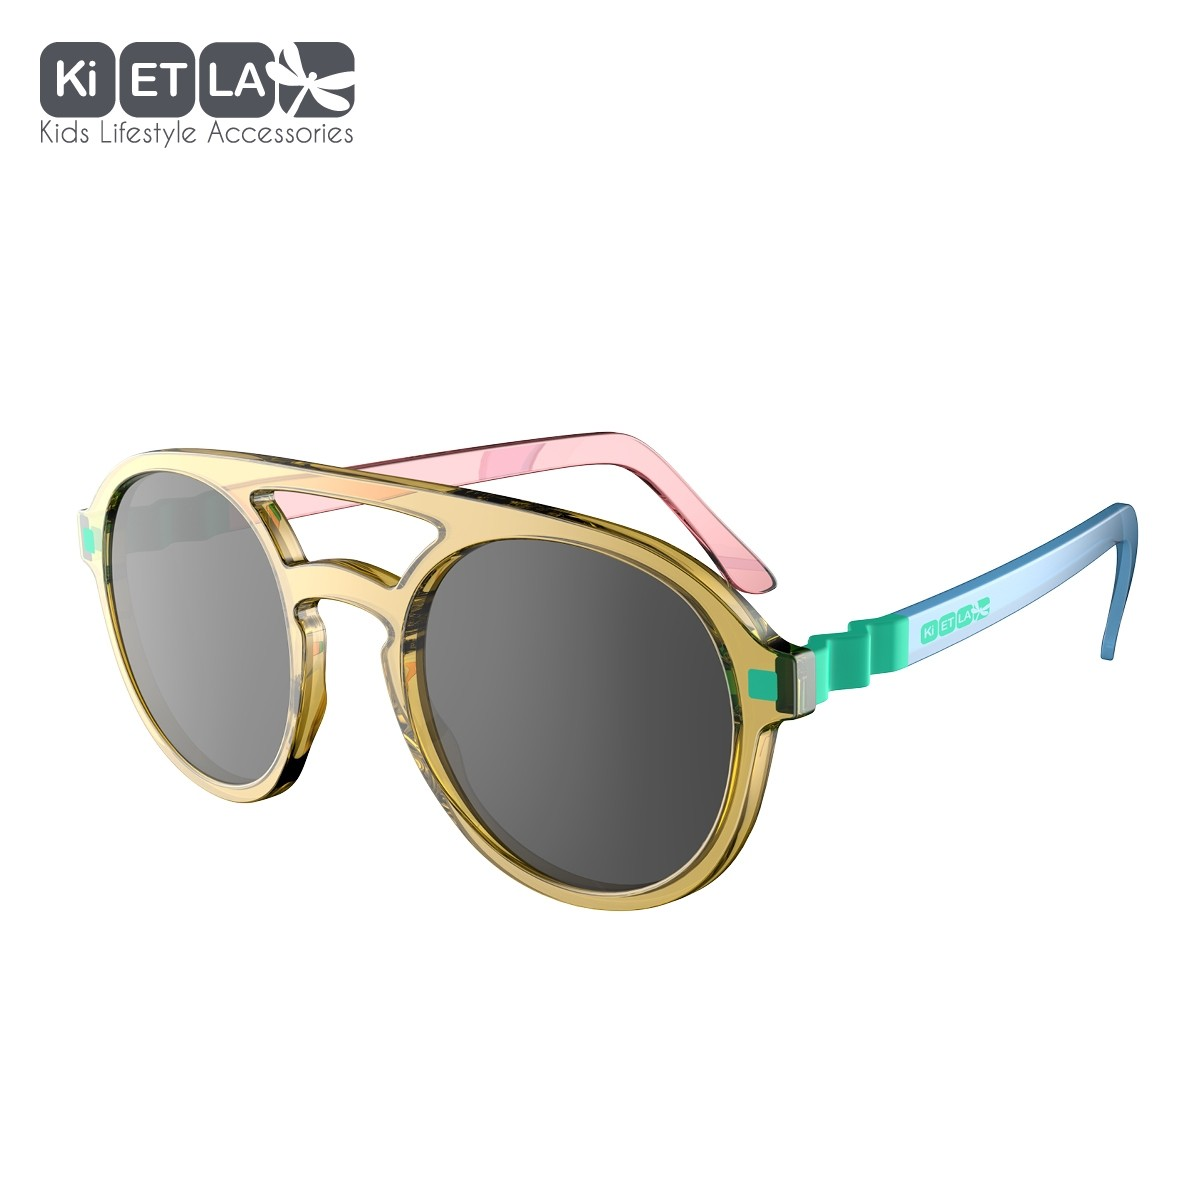 Ki ET LA Sunglasses for kids